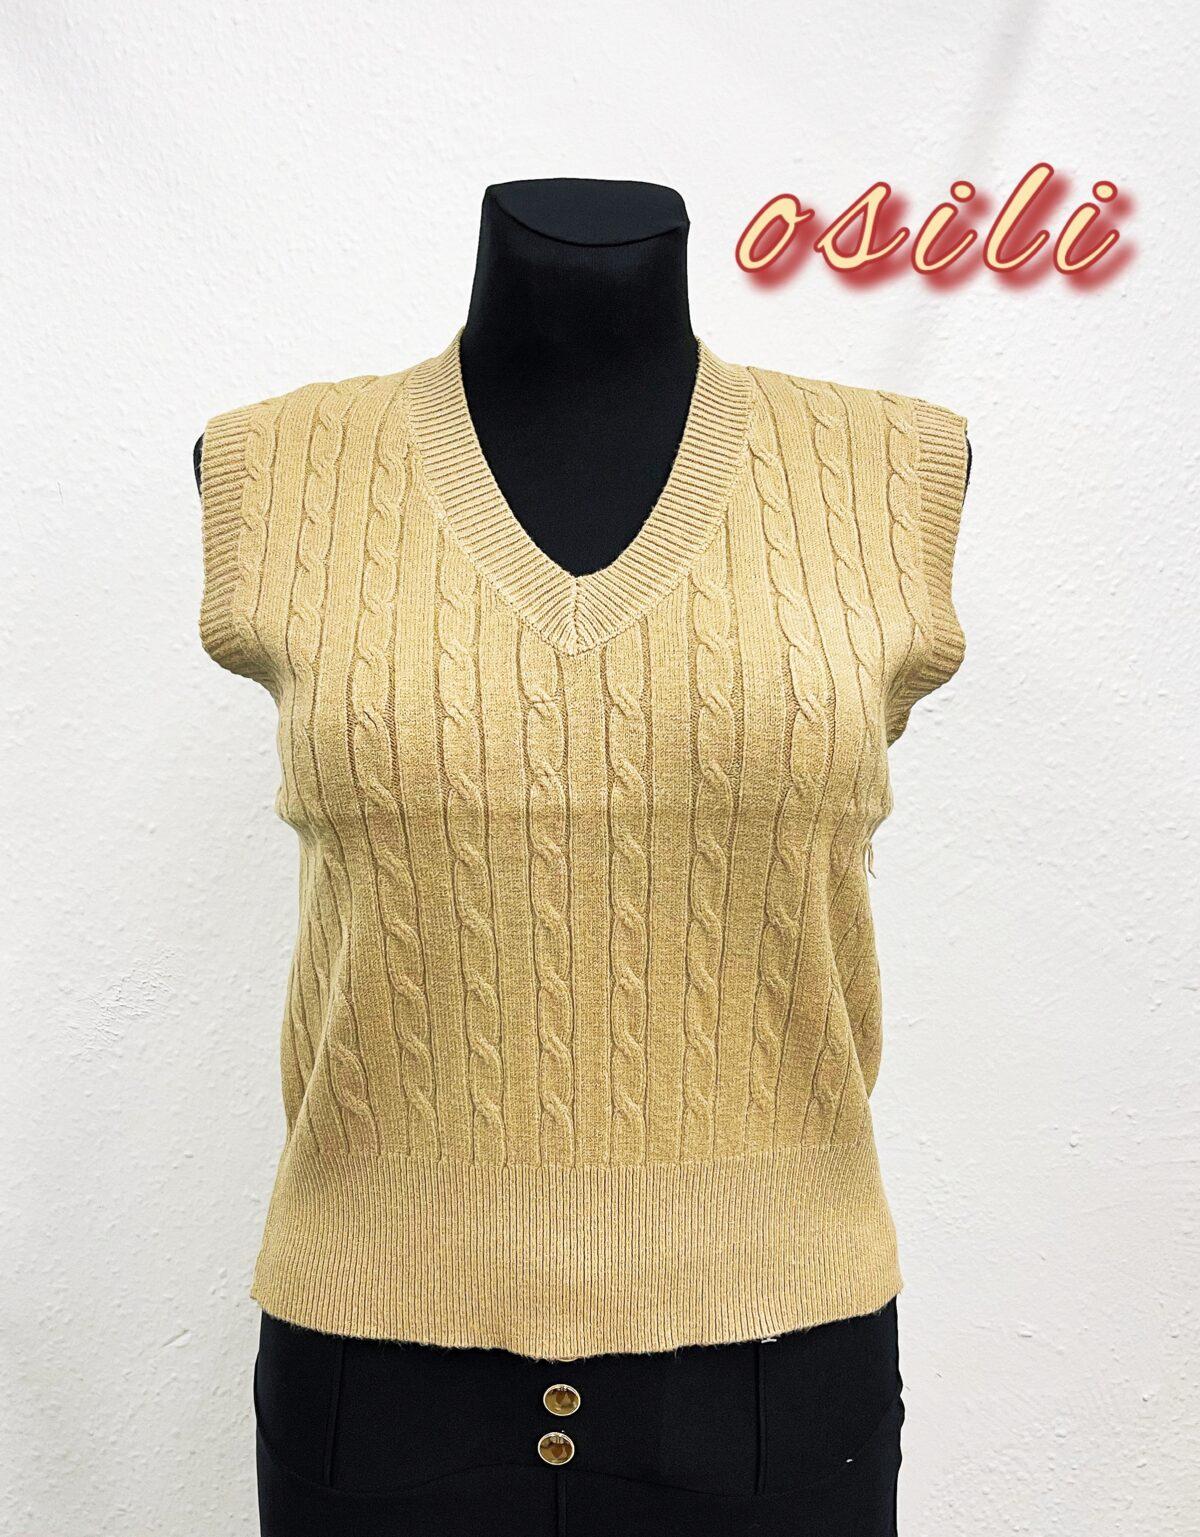 D62F8DE4 A744 4C9B 8066 CDCDBA299412 scaled Osili - Fashion - Divat